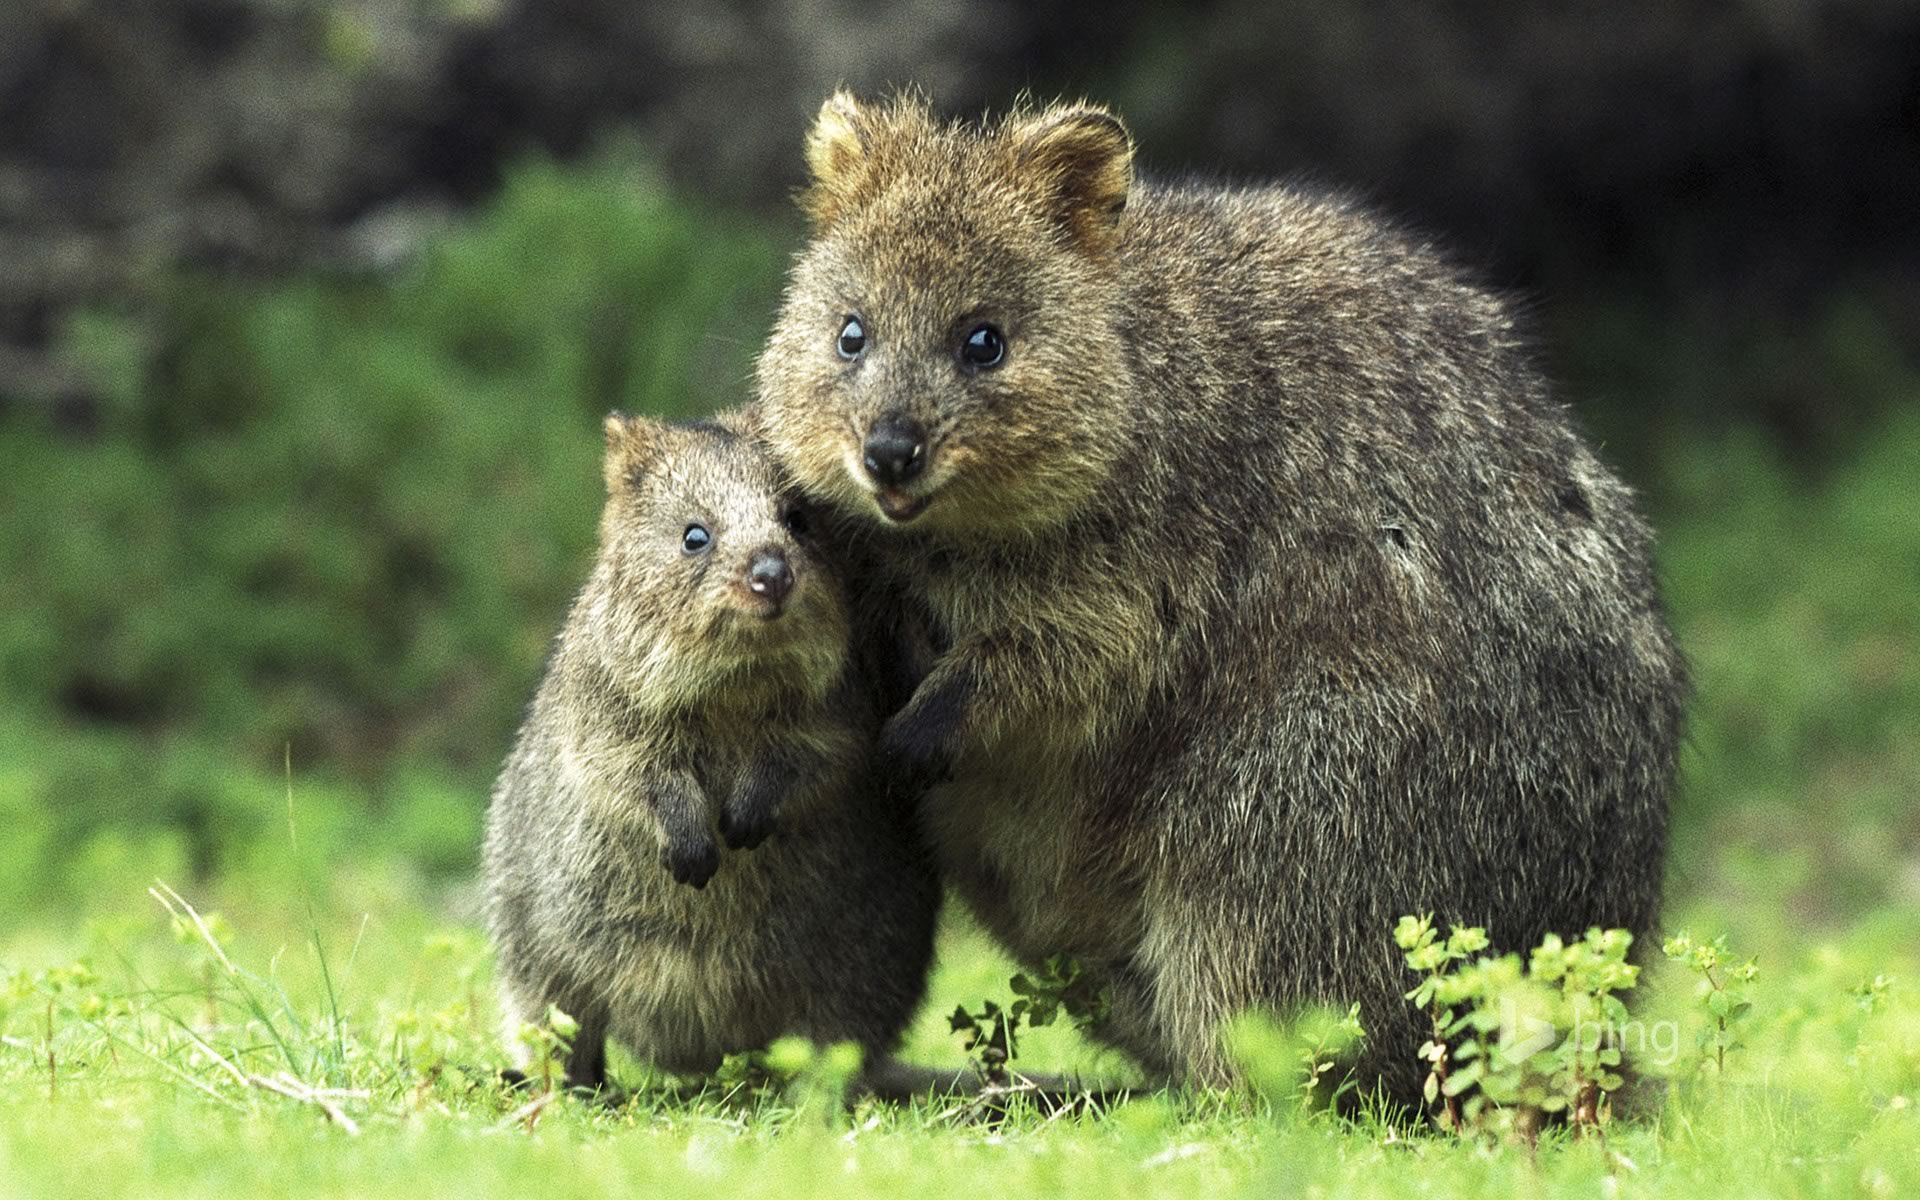 Quokka Mother And Son On Rottnest Island Western Australia C Jean Paul Ferrero Mary Evans Picture Library Ltd Age Fot Animais Felizes Animais Bonitos Animais